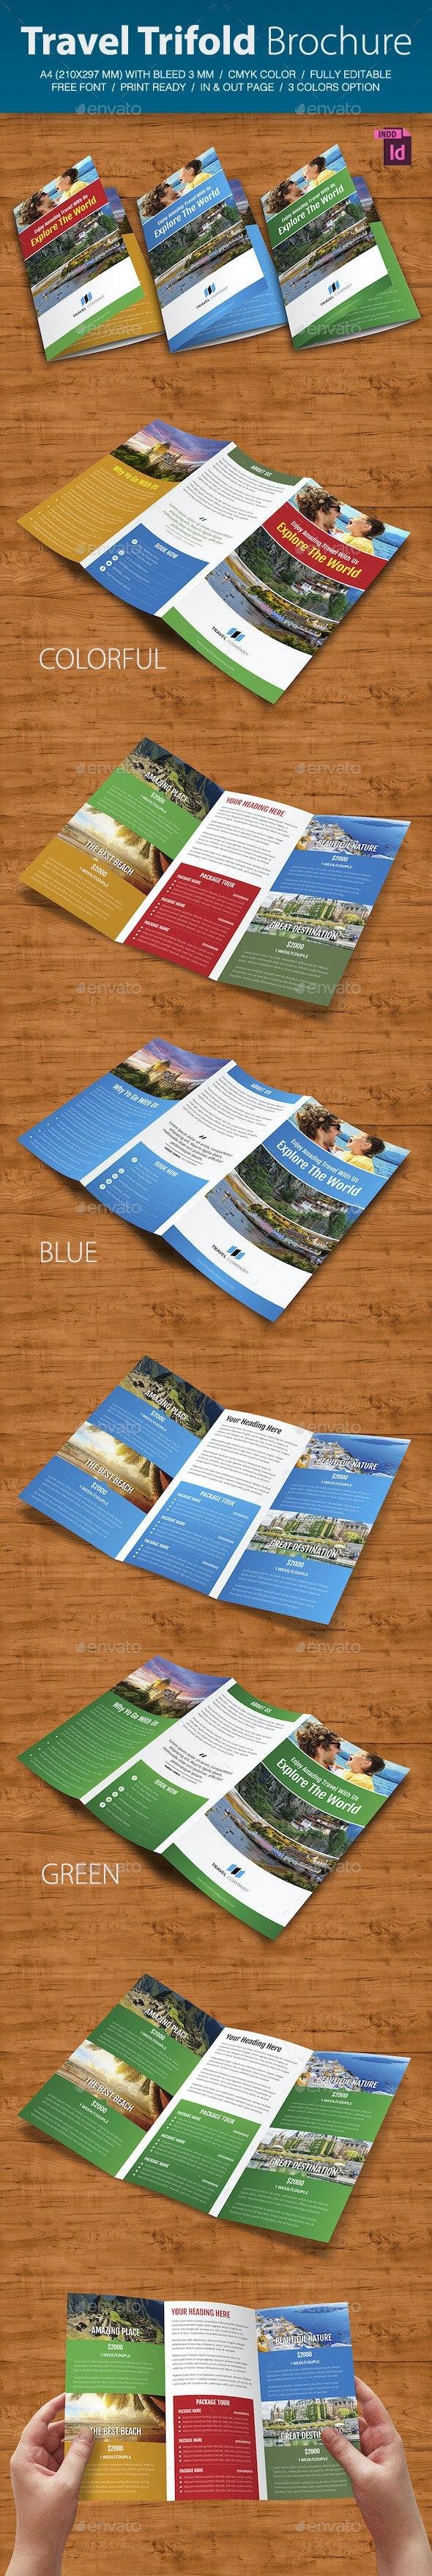 Travel Trifold Brochure V.2 - Brochures Print Templates